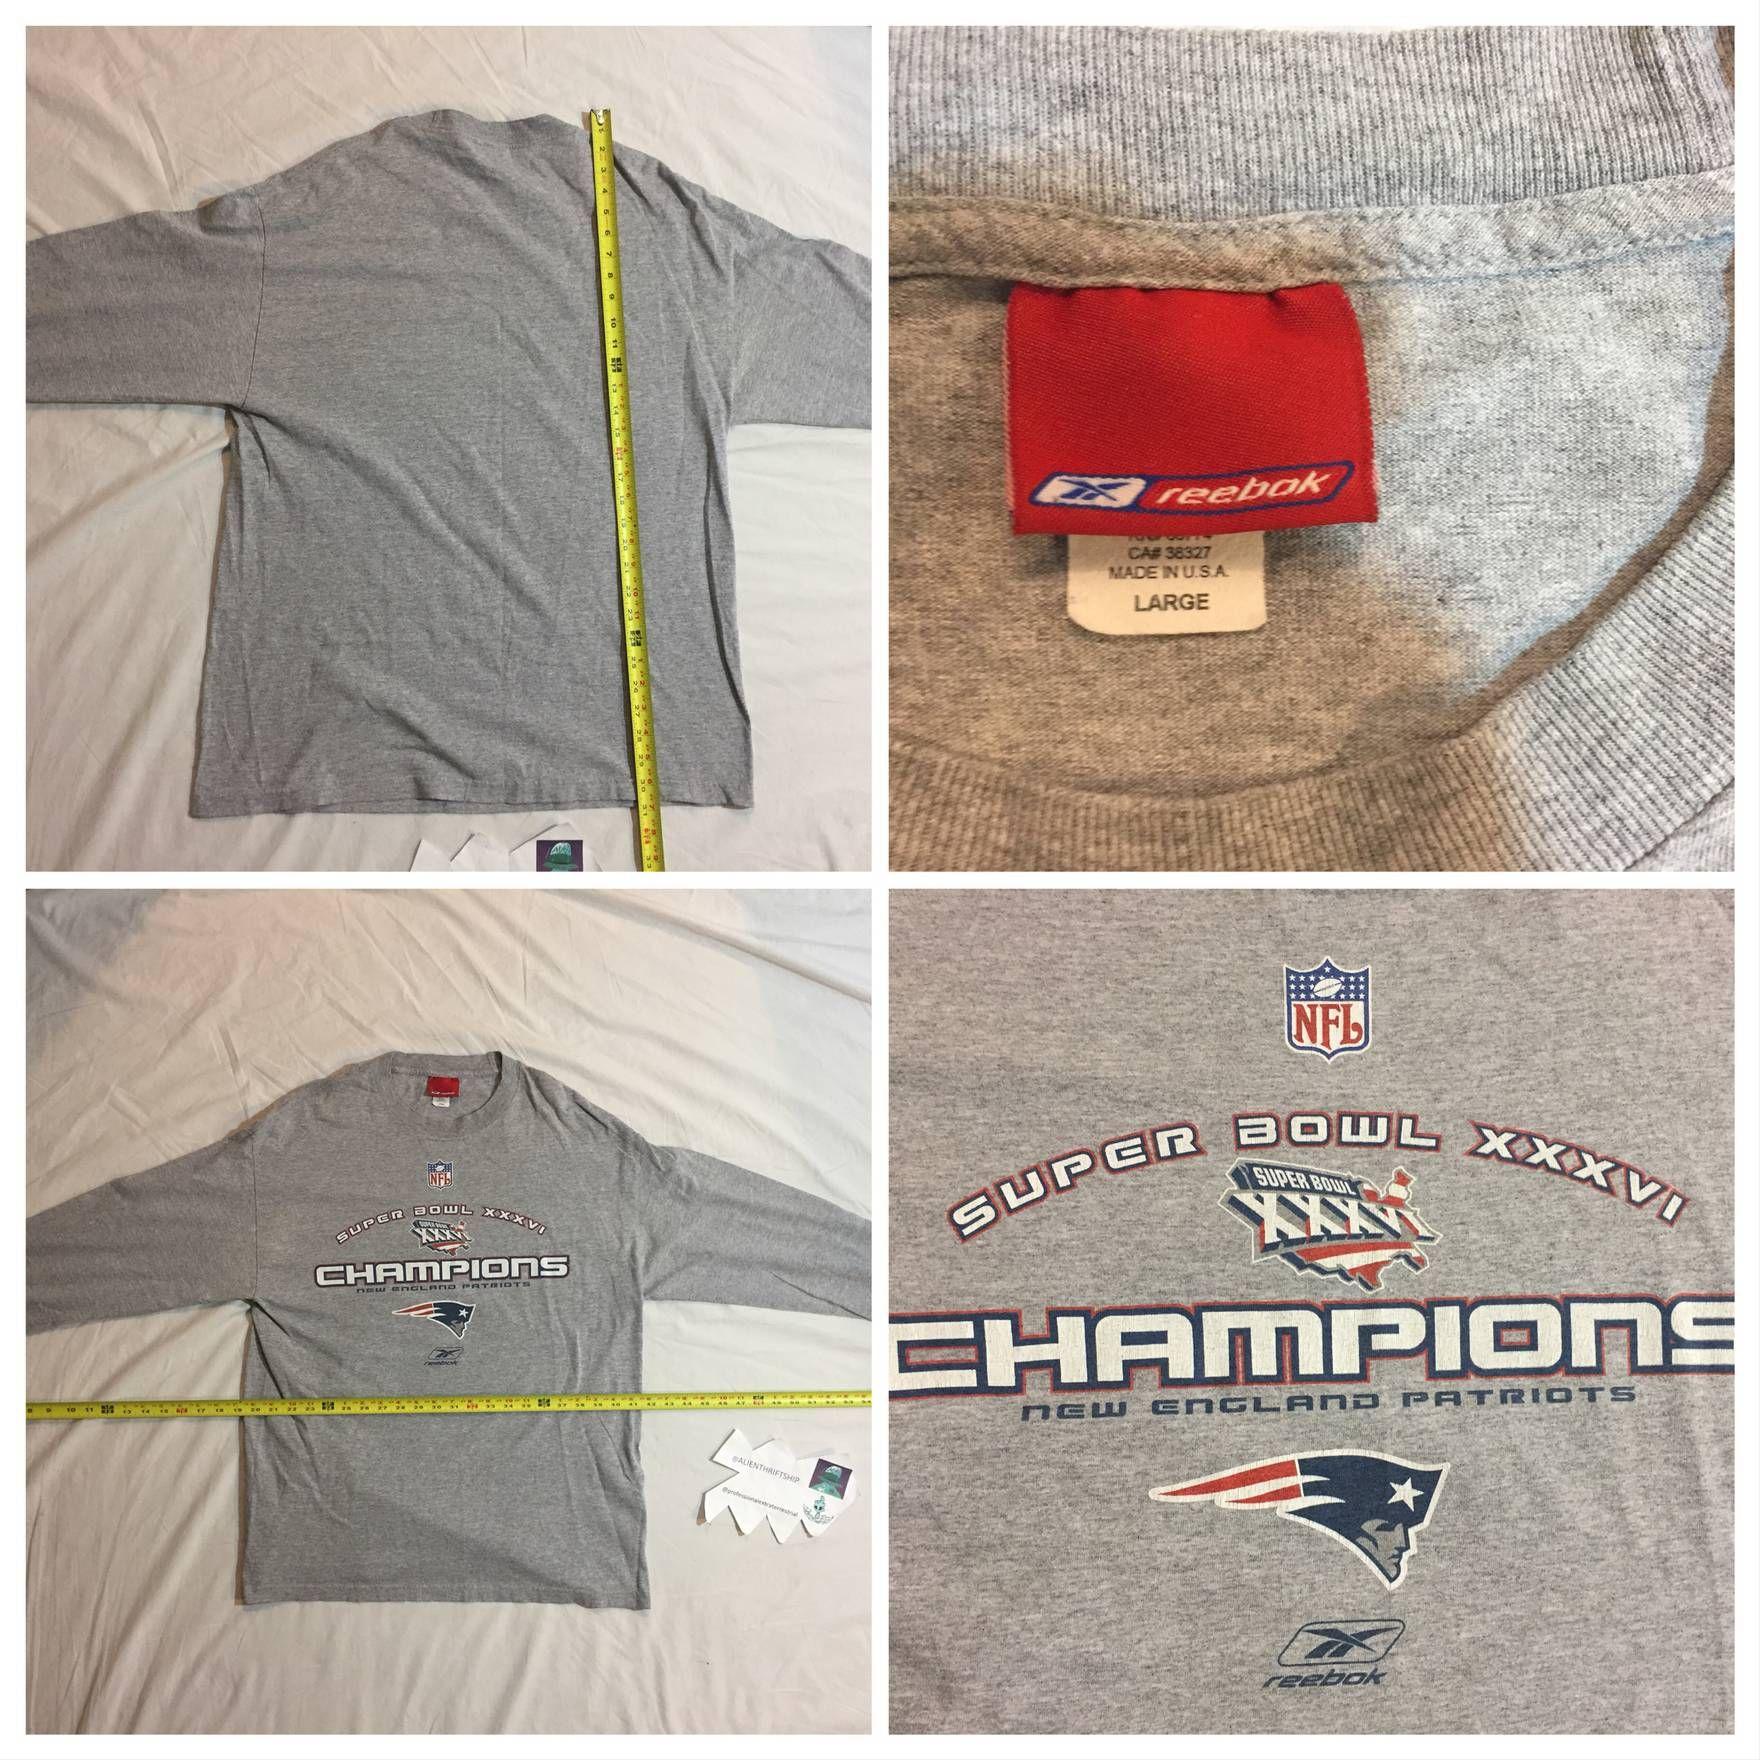 4f3b69c5 Vintage Vtg New England Patriots 2004 Super Bowl Champions Long Sleeve  Graphic T-Shirt Gray Grey Large Vintage Size US L / EU 52-54 / 3 - 1